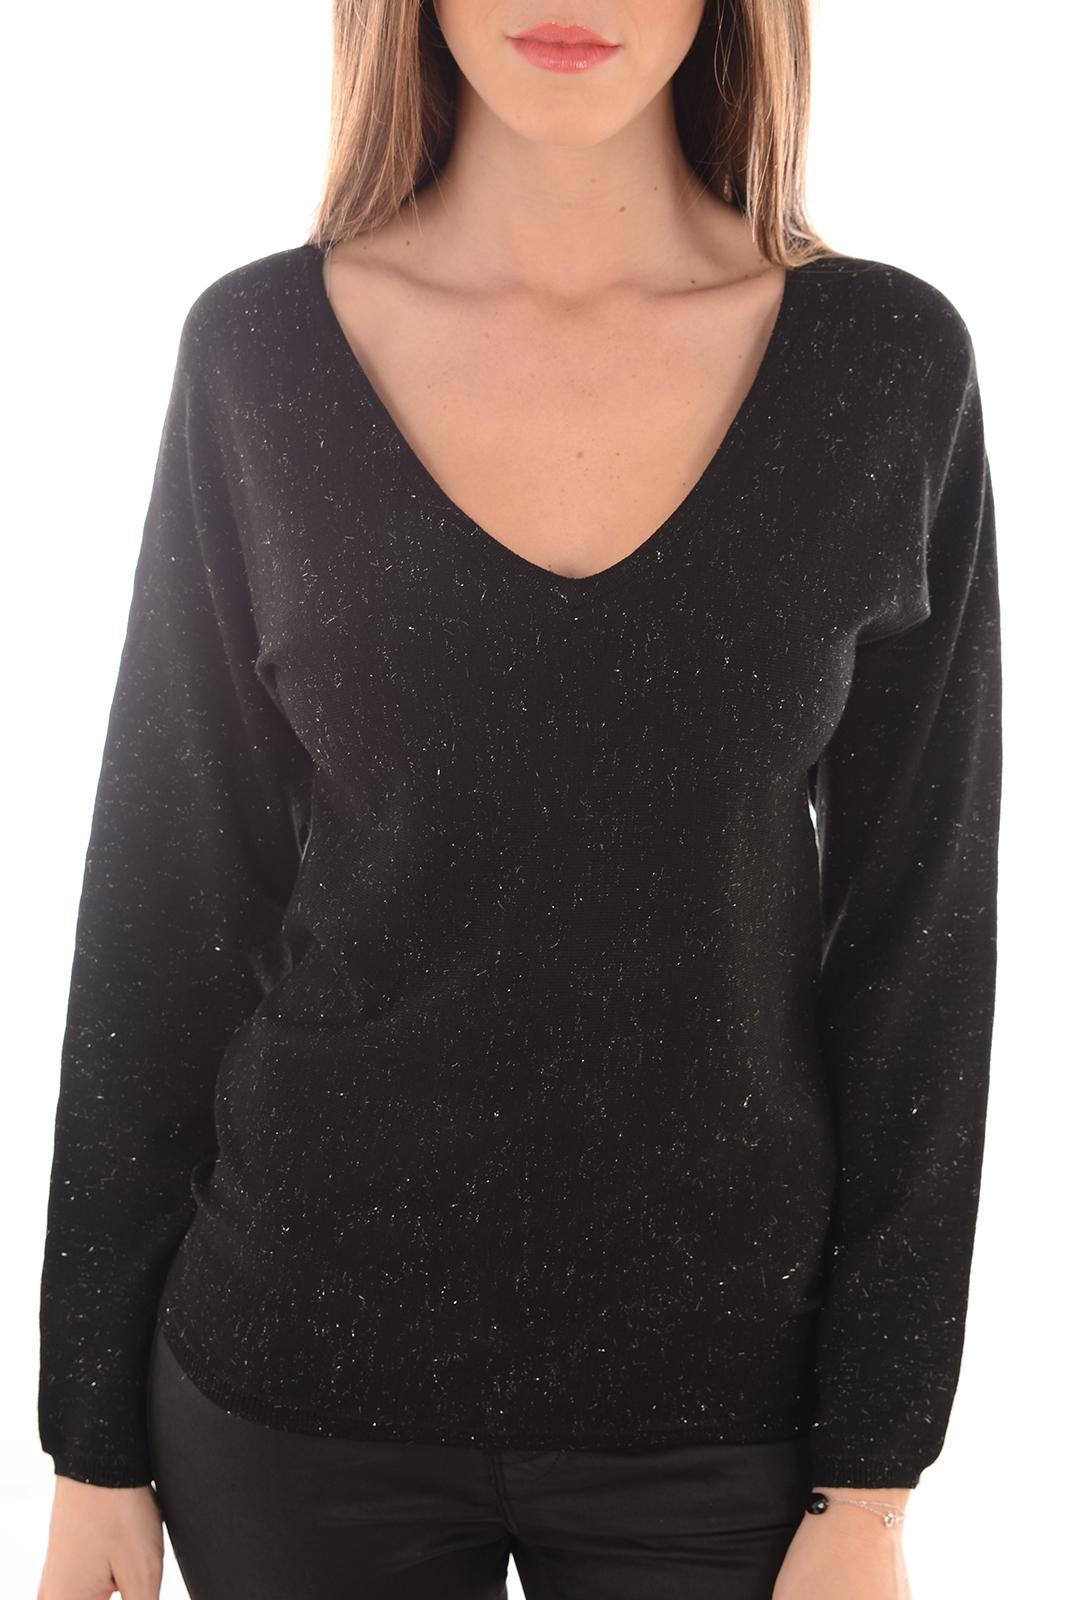 Pulls & gilets  Vero moda GLORY LENA LS V NECK BLOUSE BLACK/W SILVER